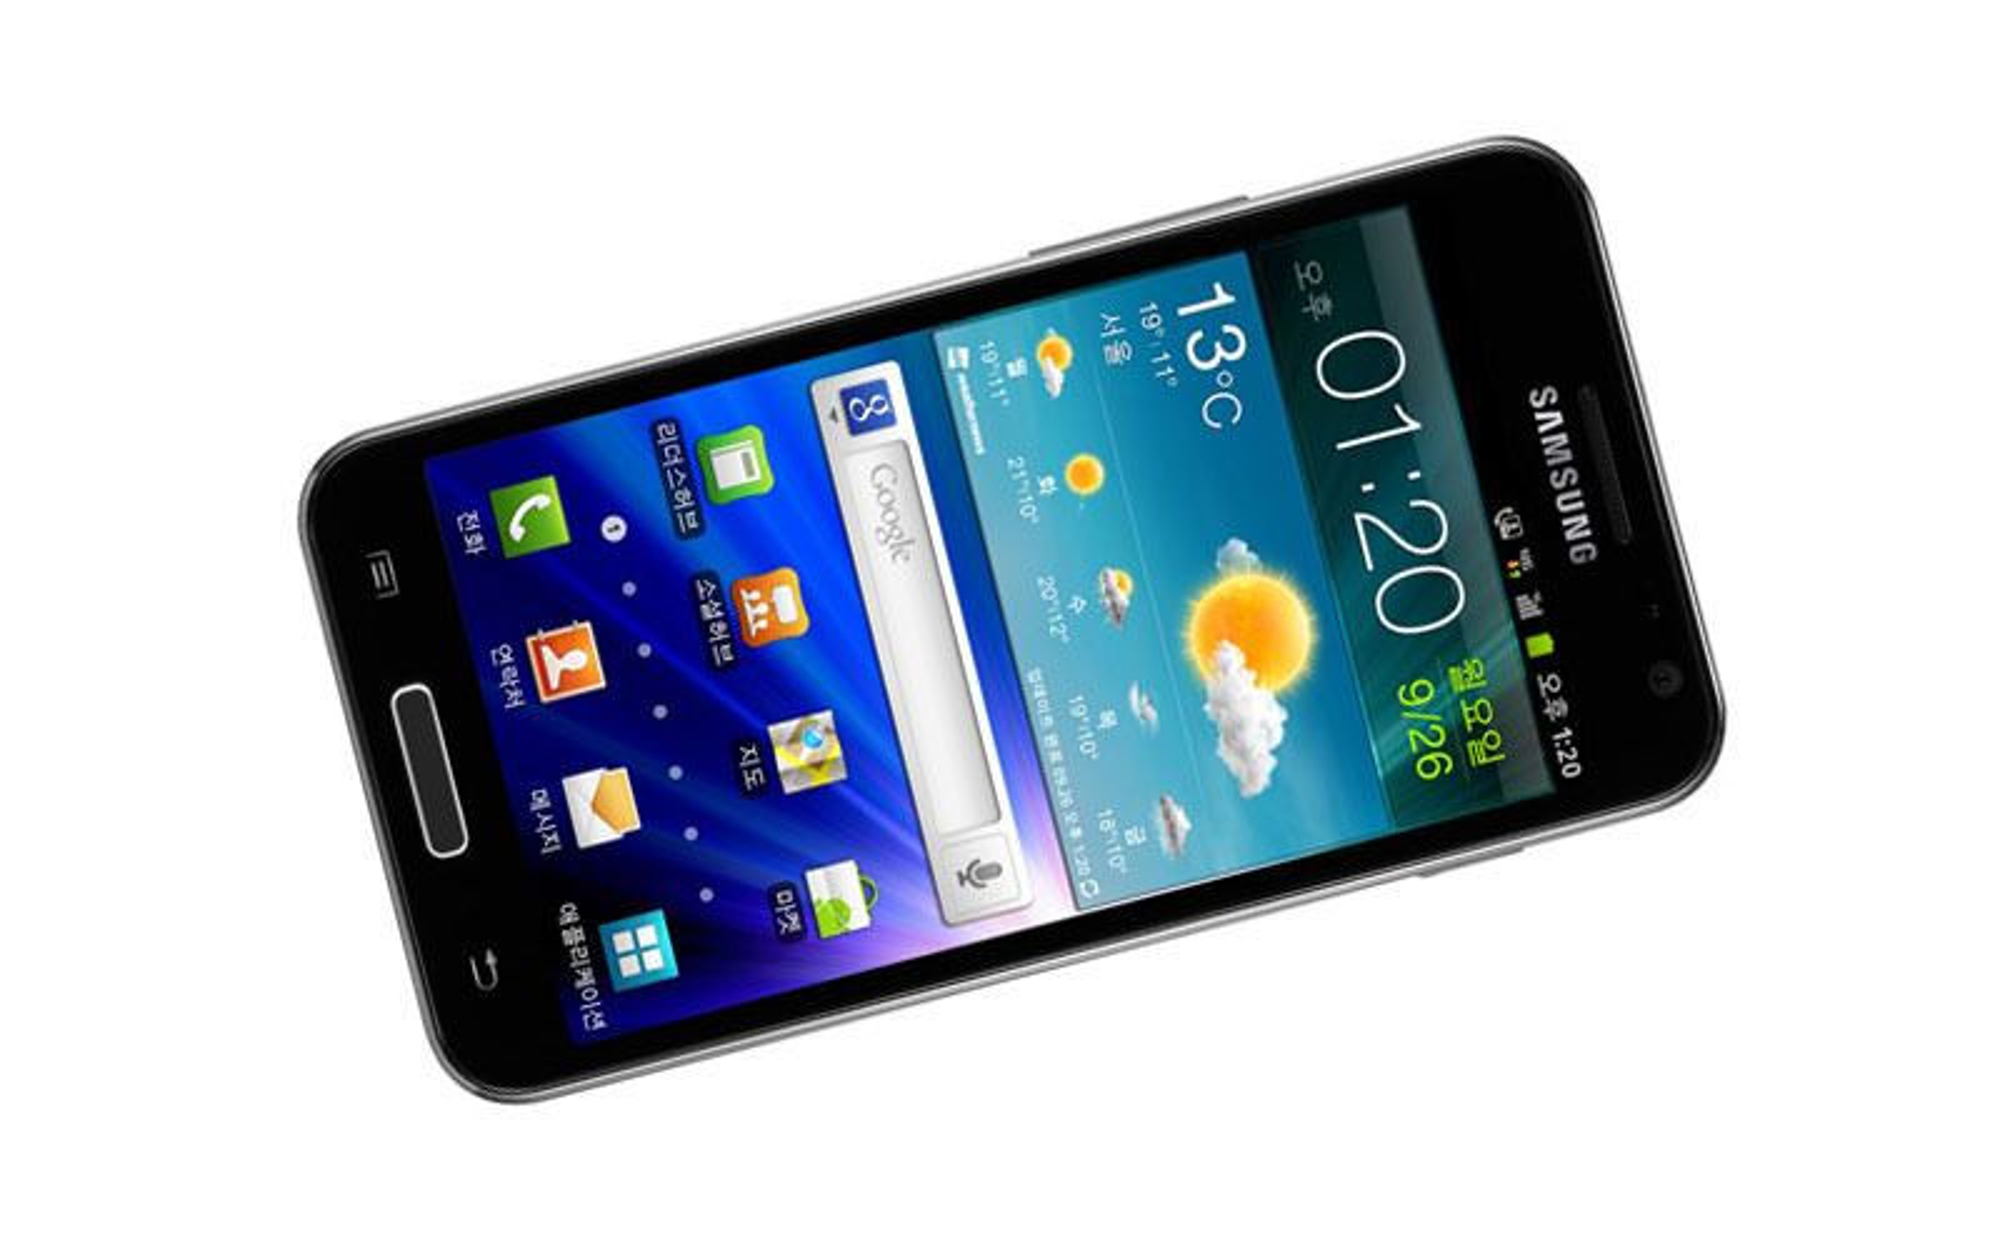 Galaxy S II HD på vei til Norge?